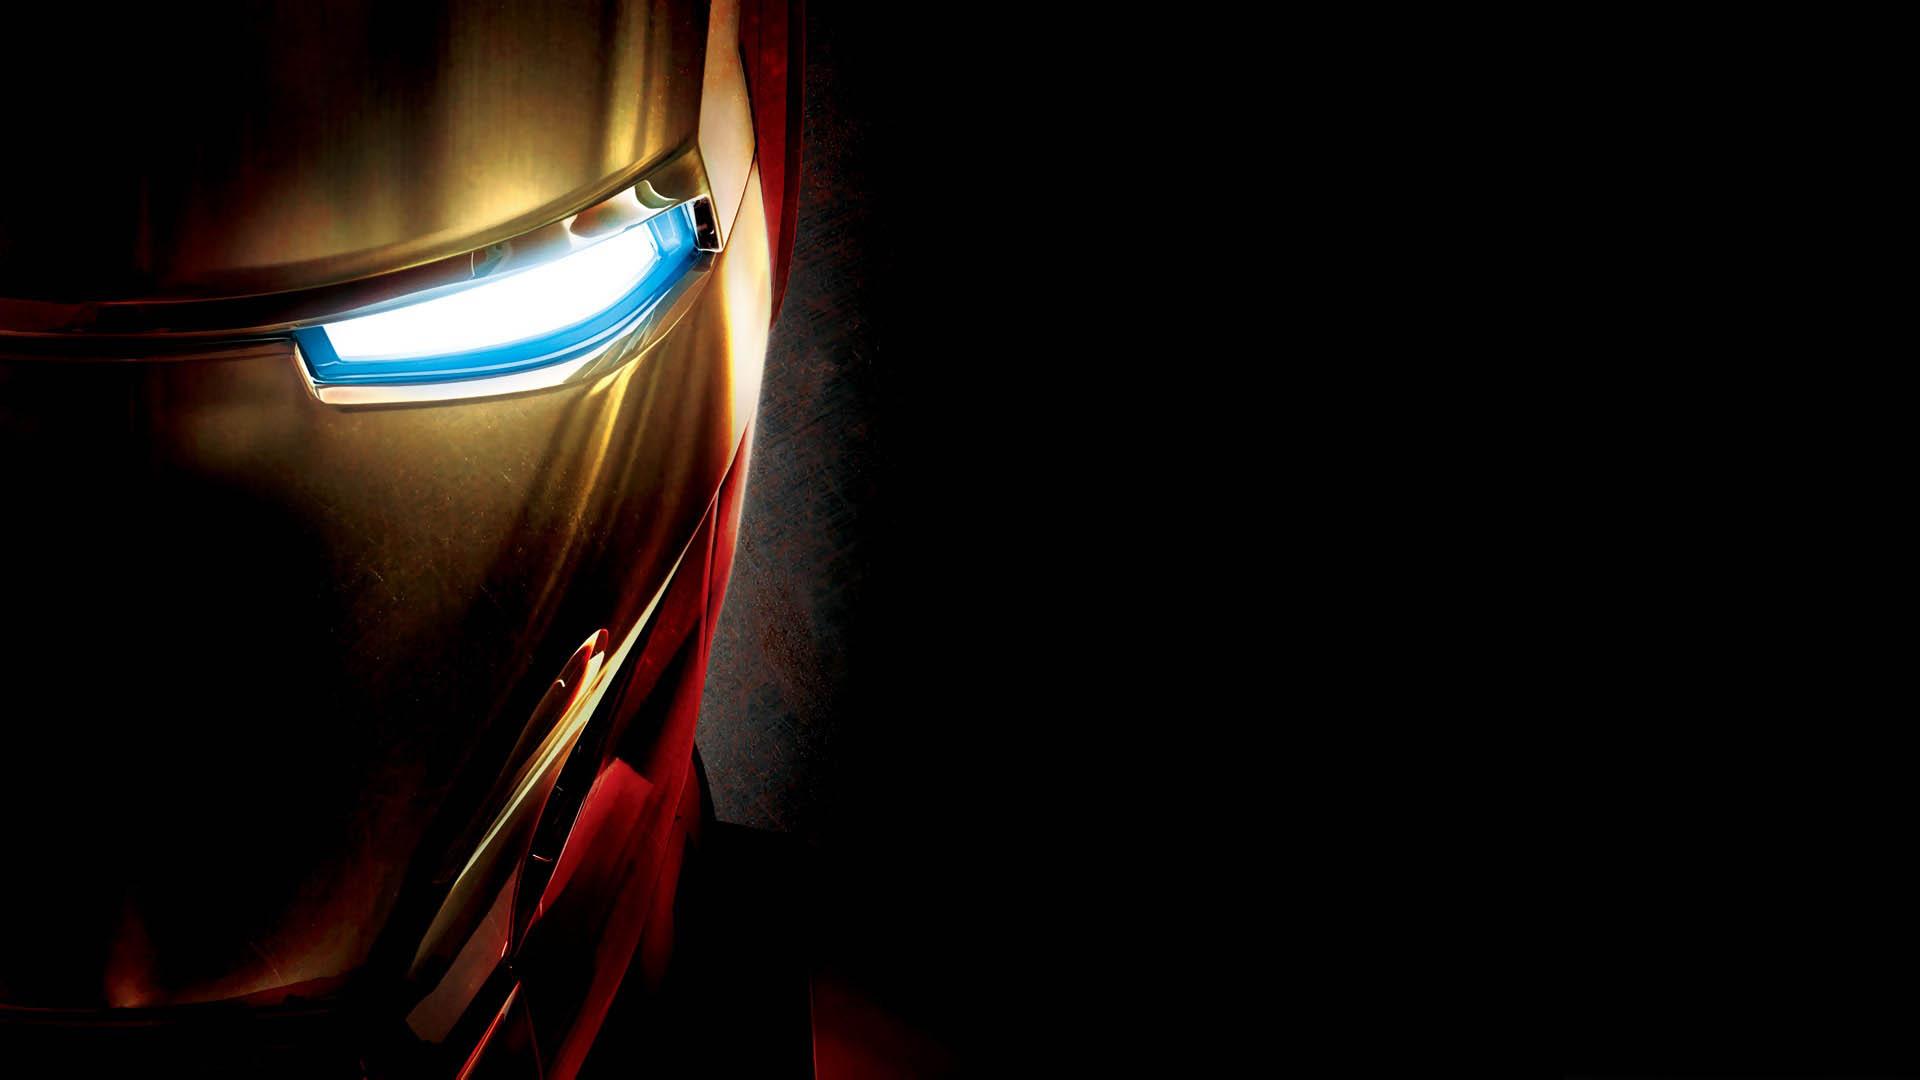 iron-man-3-wallpaper-1.jpg